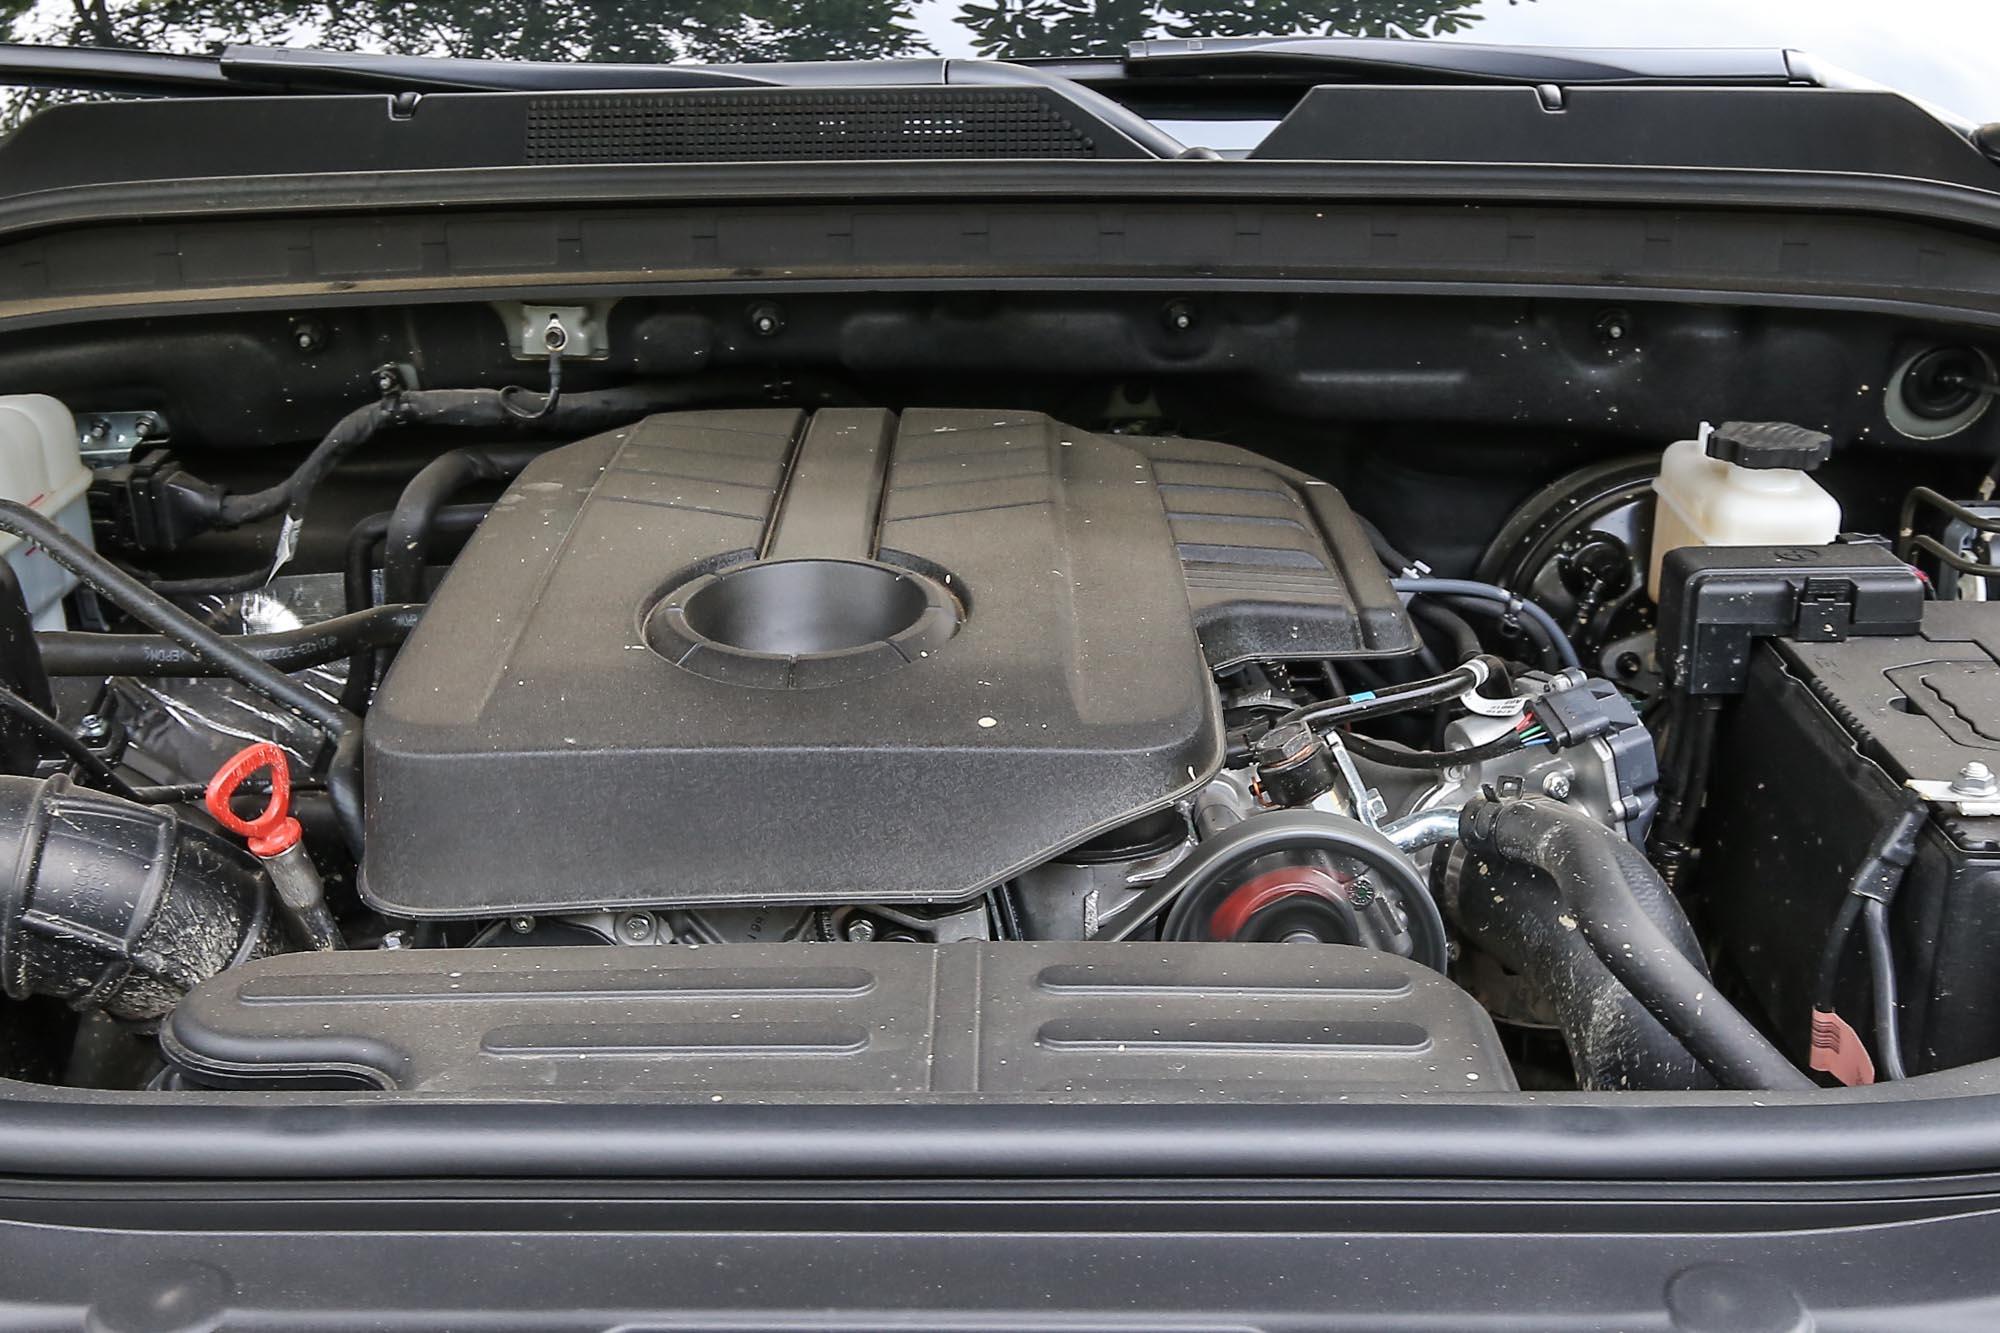 Rexton 搭載 2.2 升直列四缸柴油引擎,具備 181ps/4000rpm最大馬力與 42.8kgm/1600~2600rpm 最大扭力輸出。